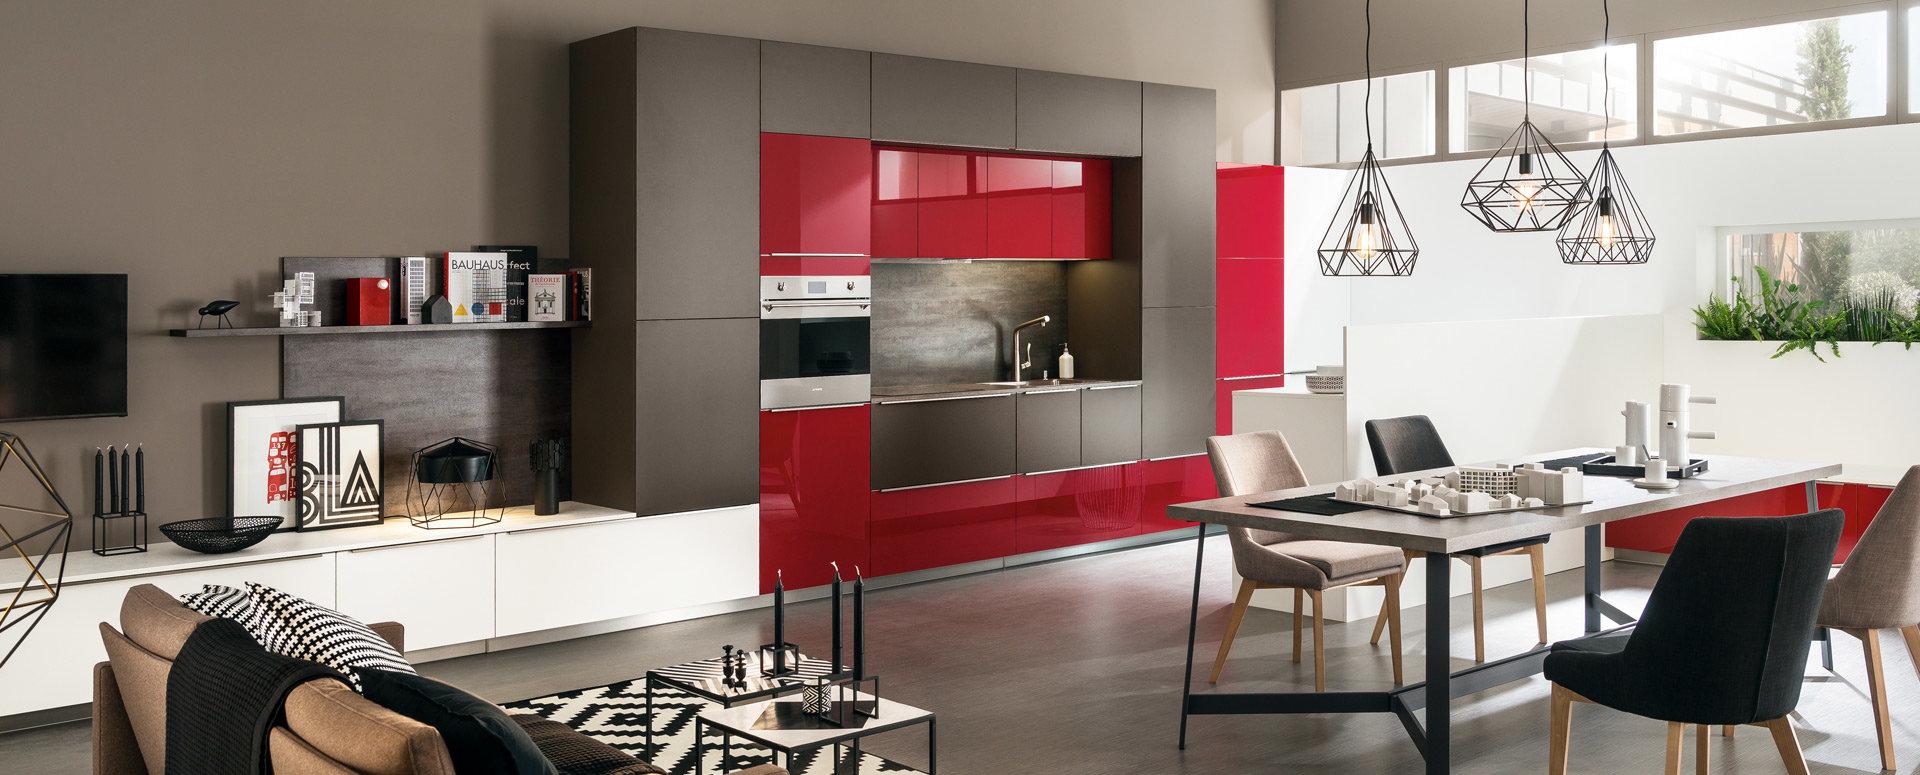 Moderne kjøkken rød geometri